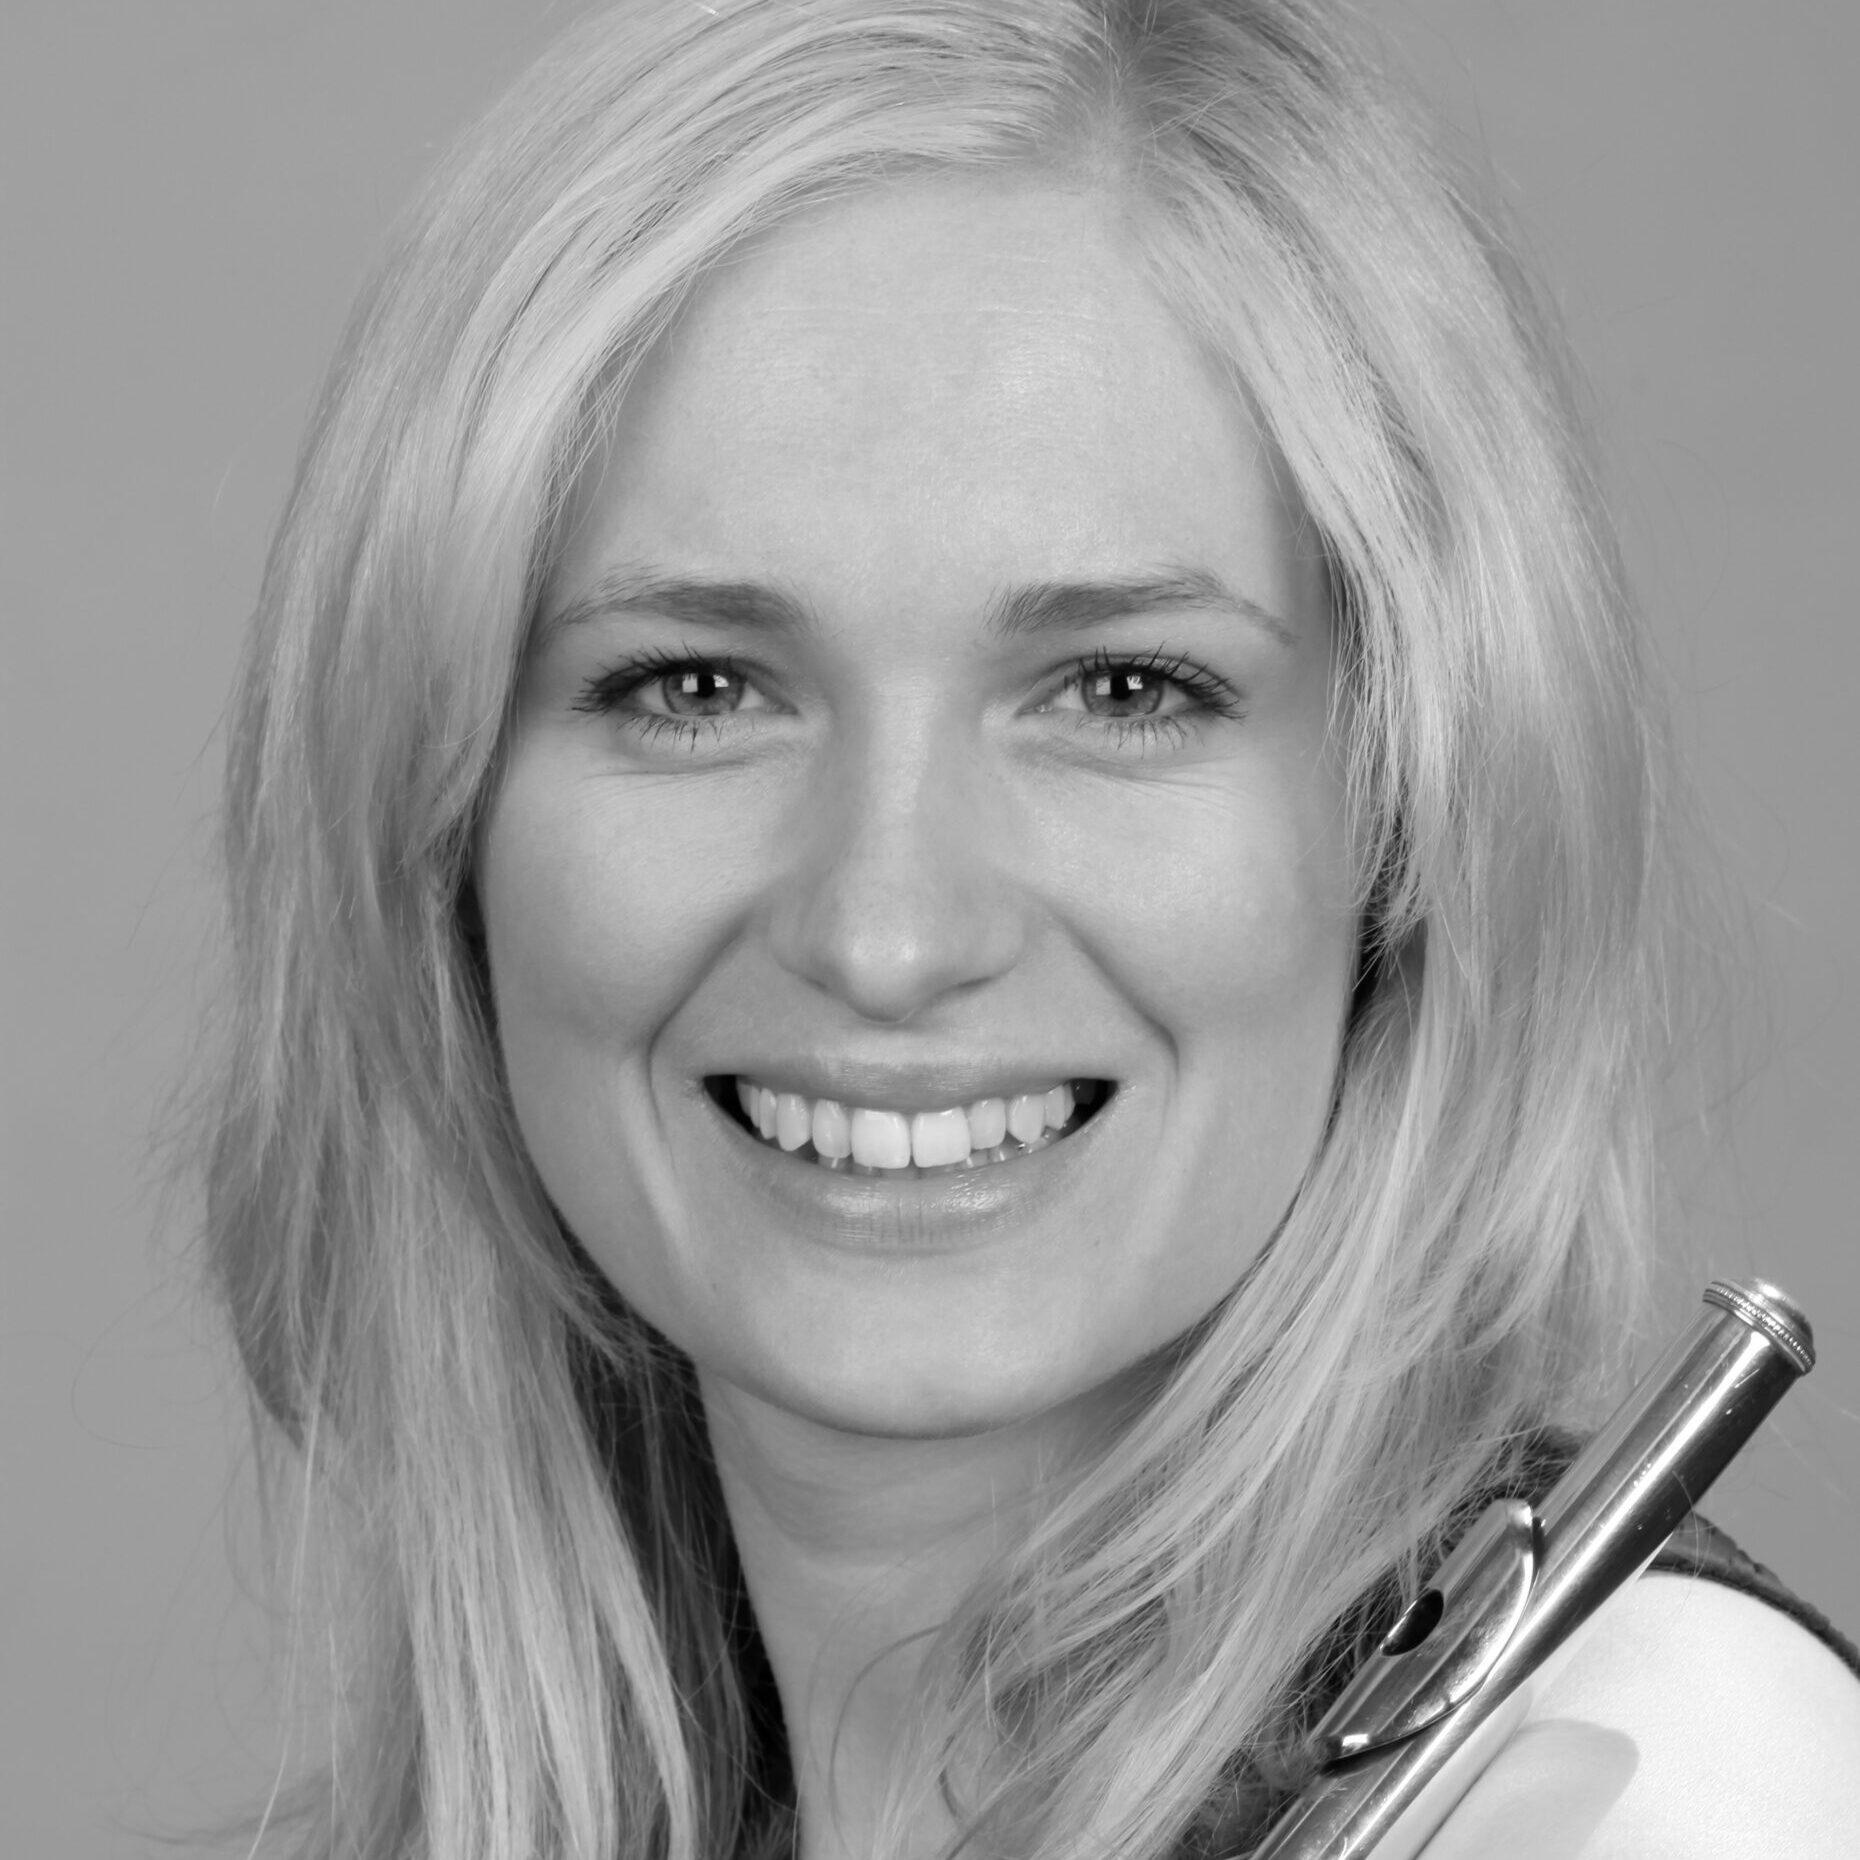 Chloe Vincent